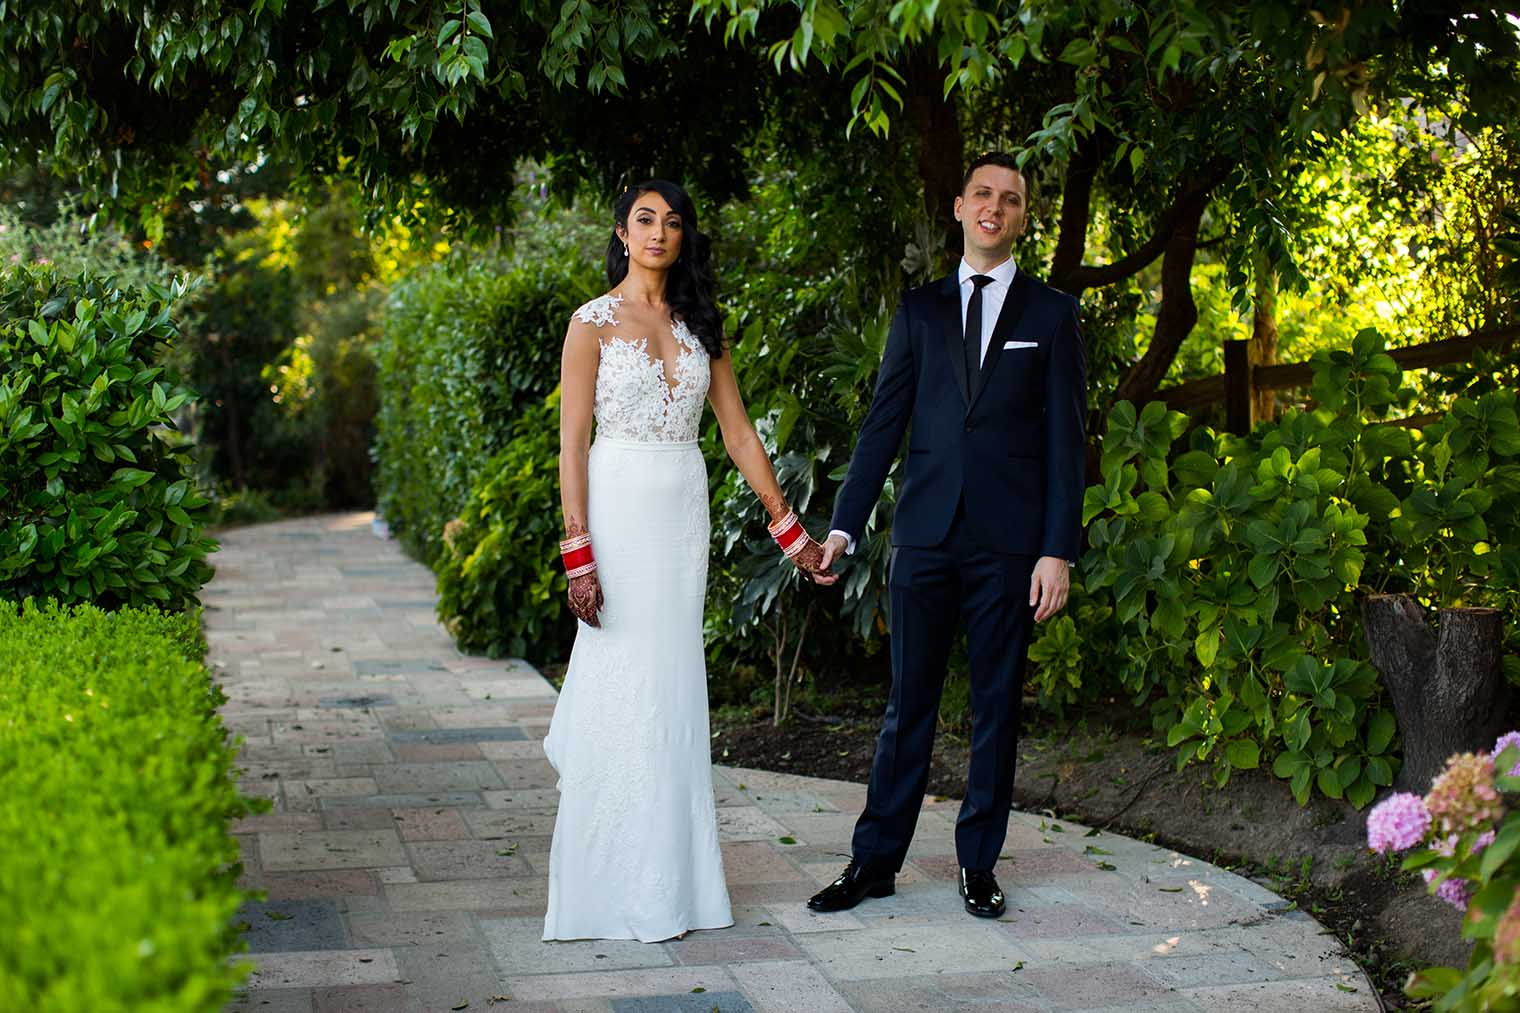 V. Sattui Winery Wedding Portraits of Bride and Groom